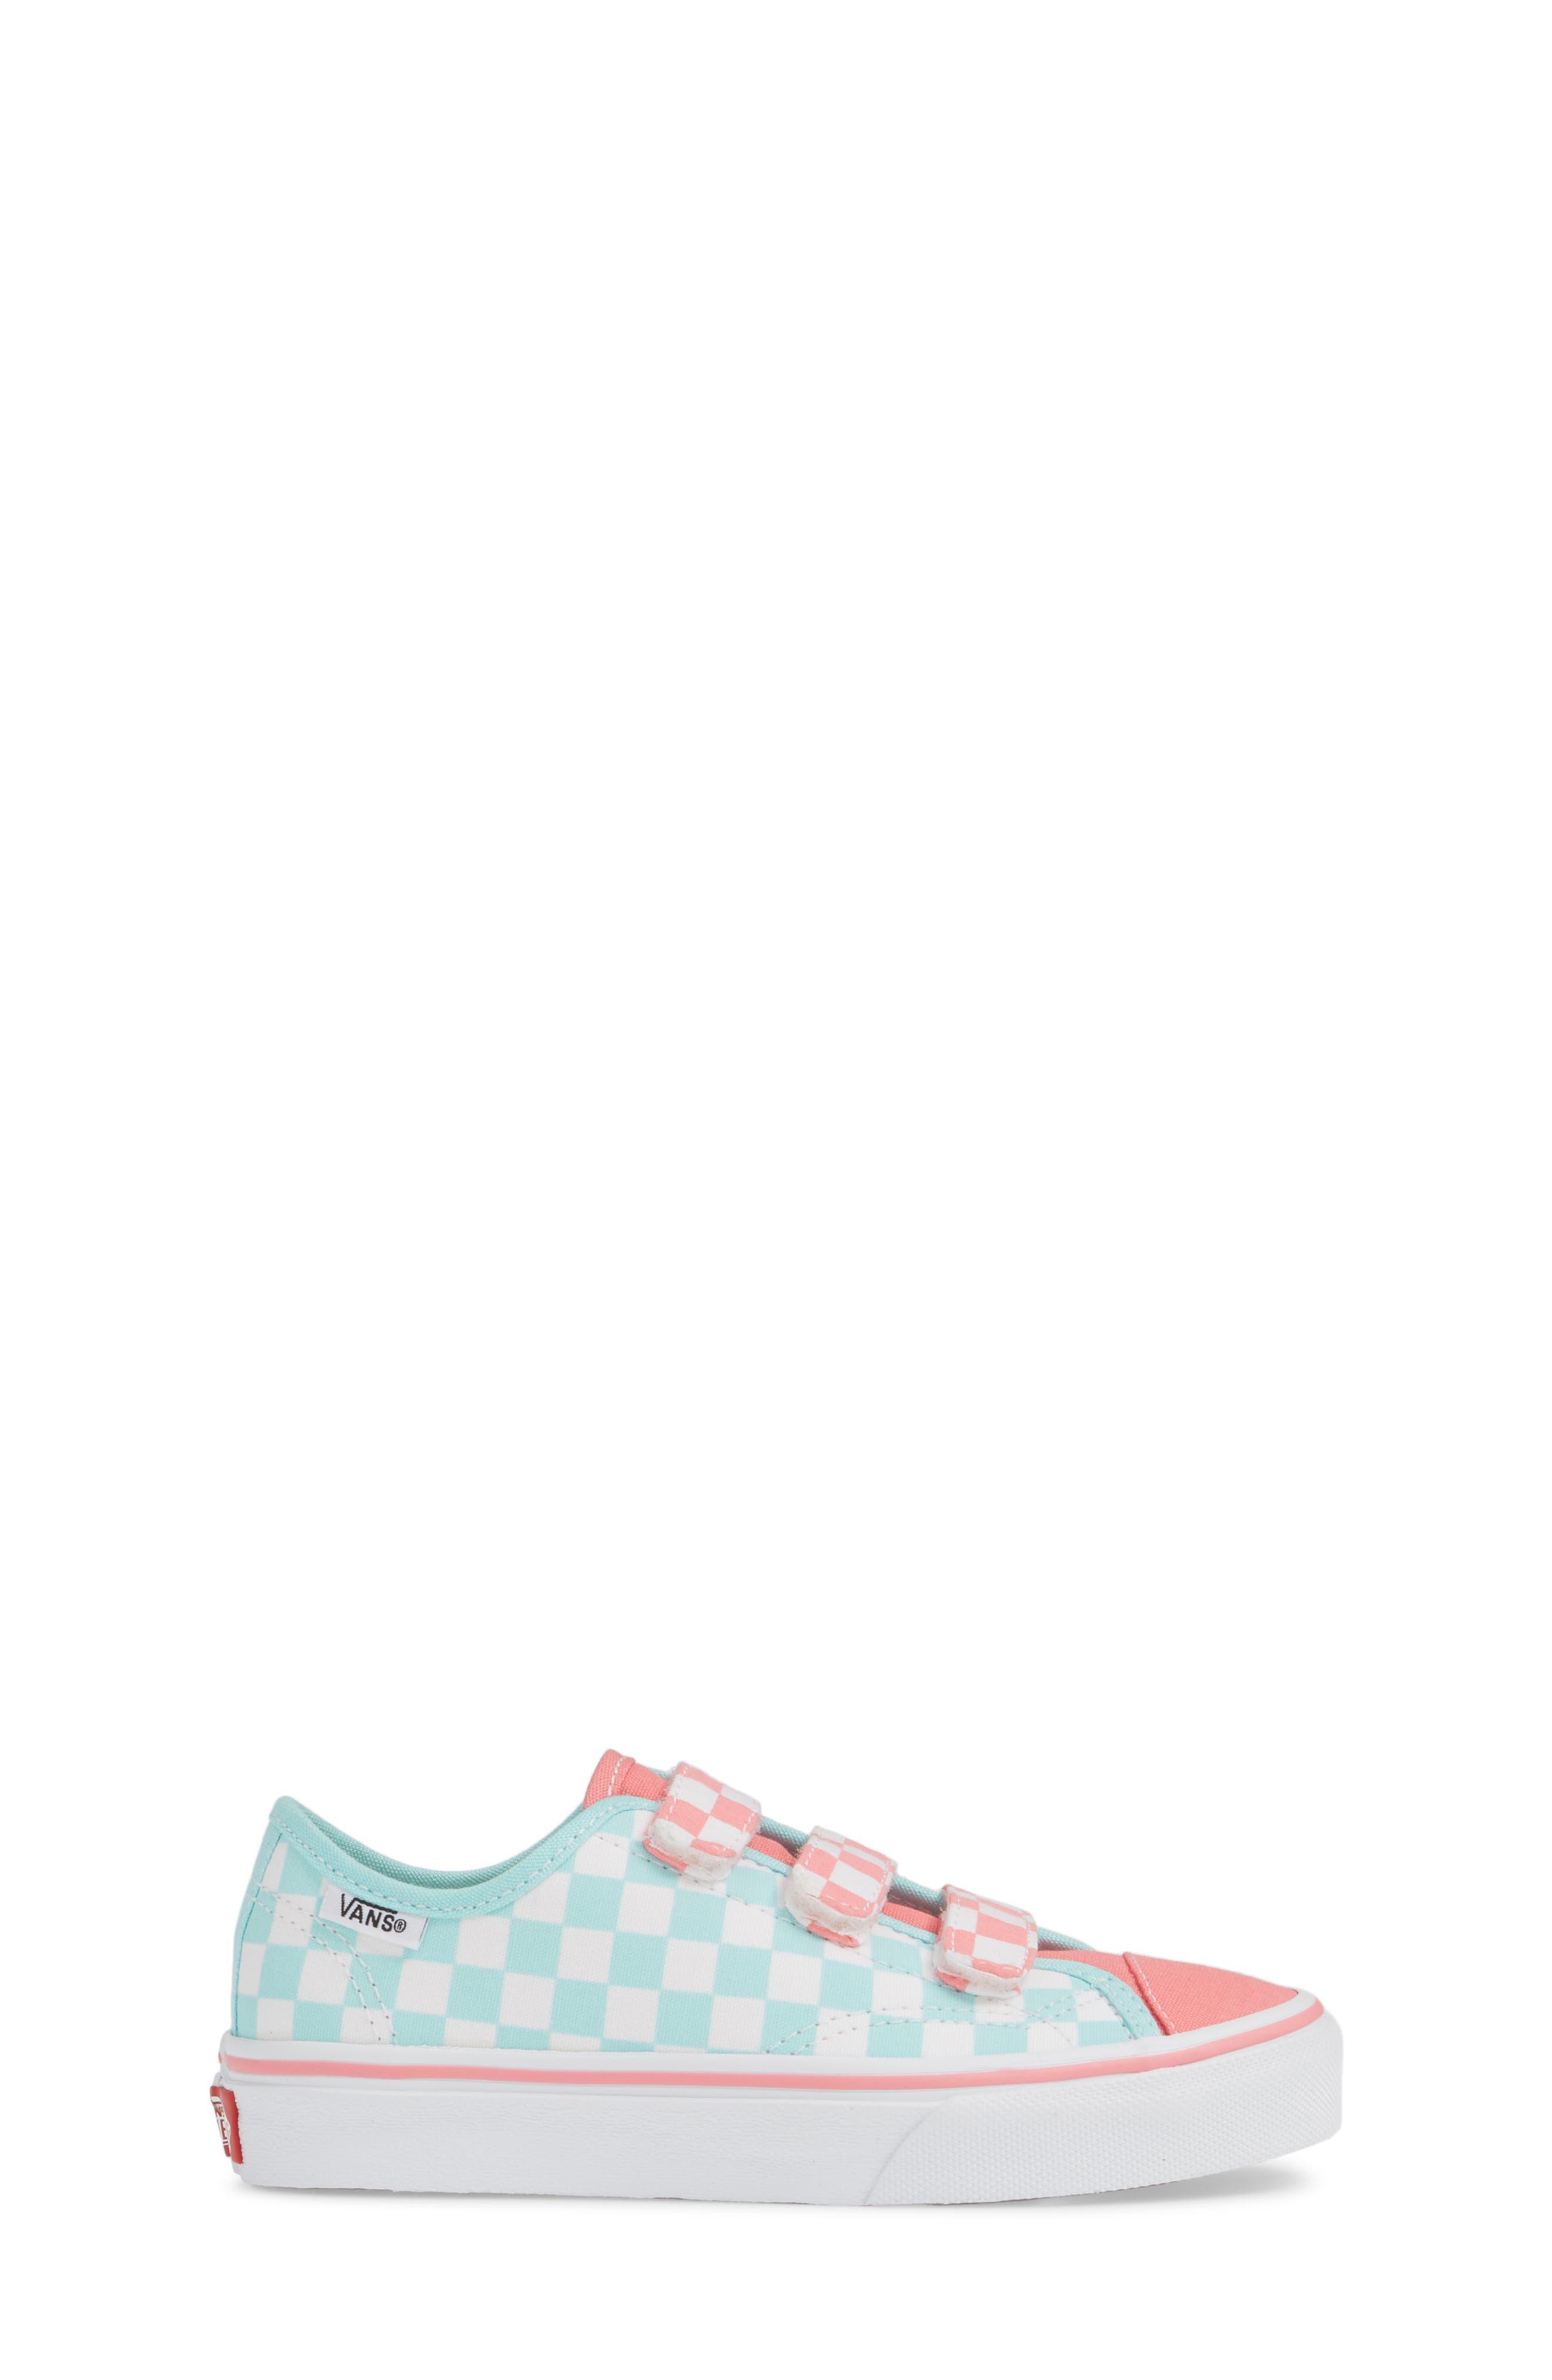 VANS, Style 23V Sneaker, Alternate thumbnail 3, color, BLUE TINT/ STRAWBERRY PINK